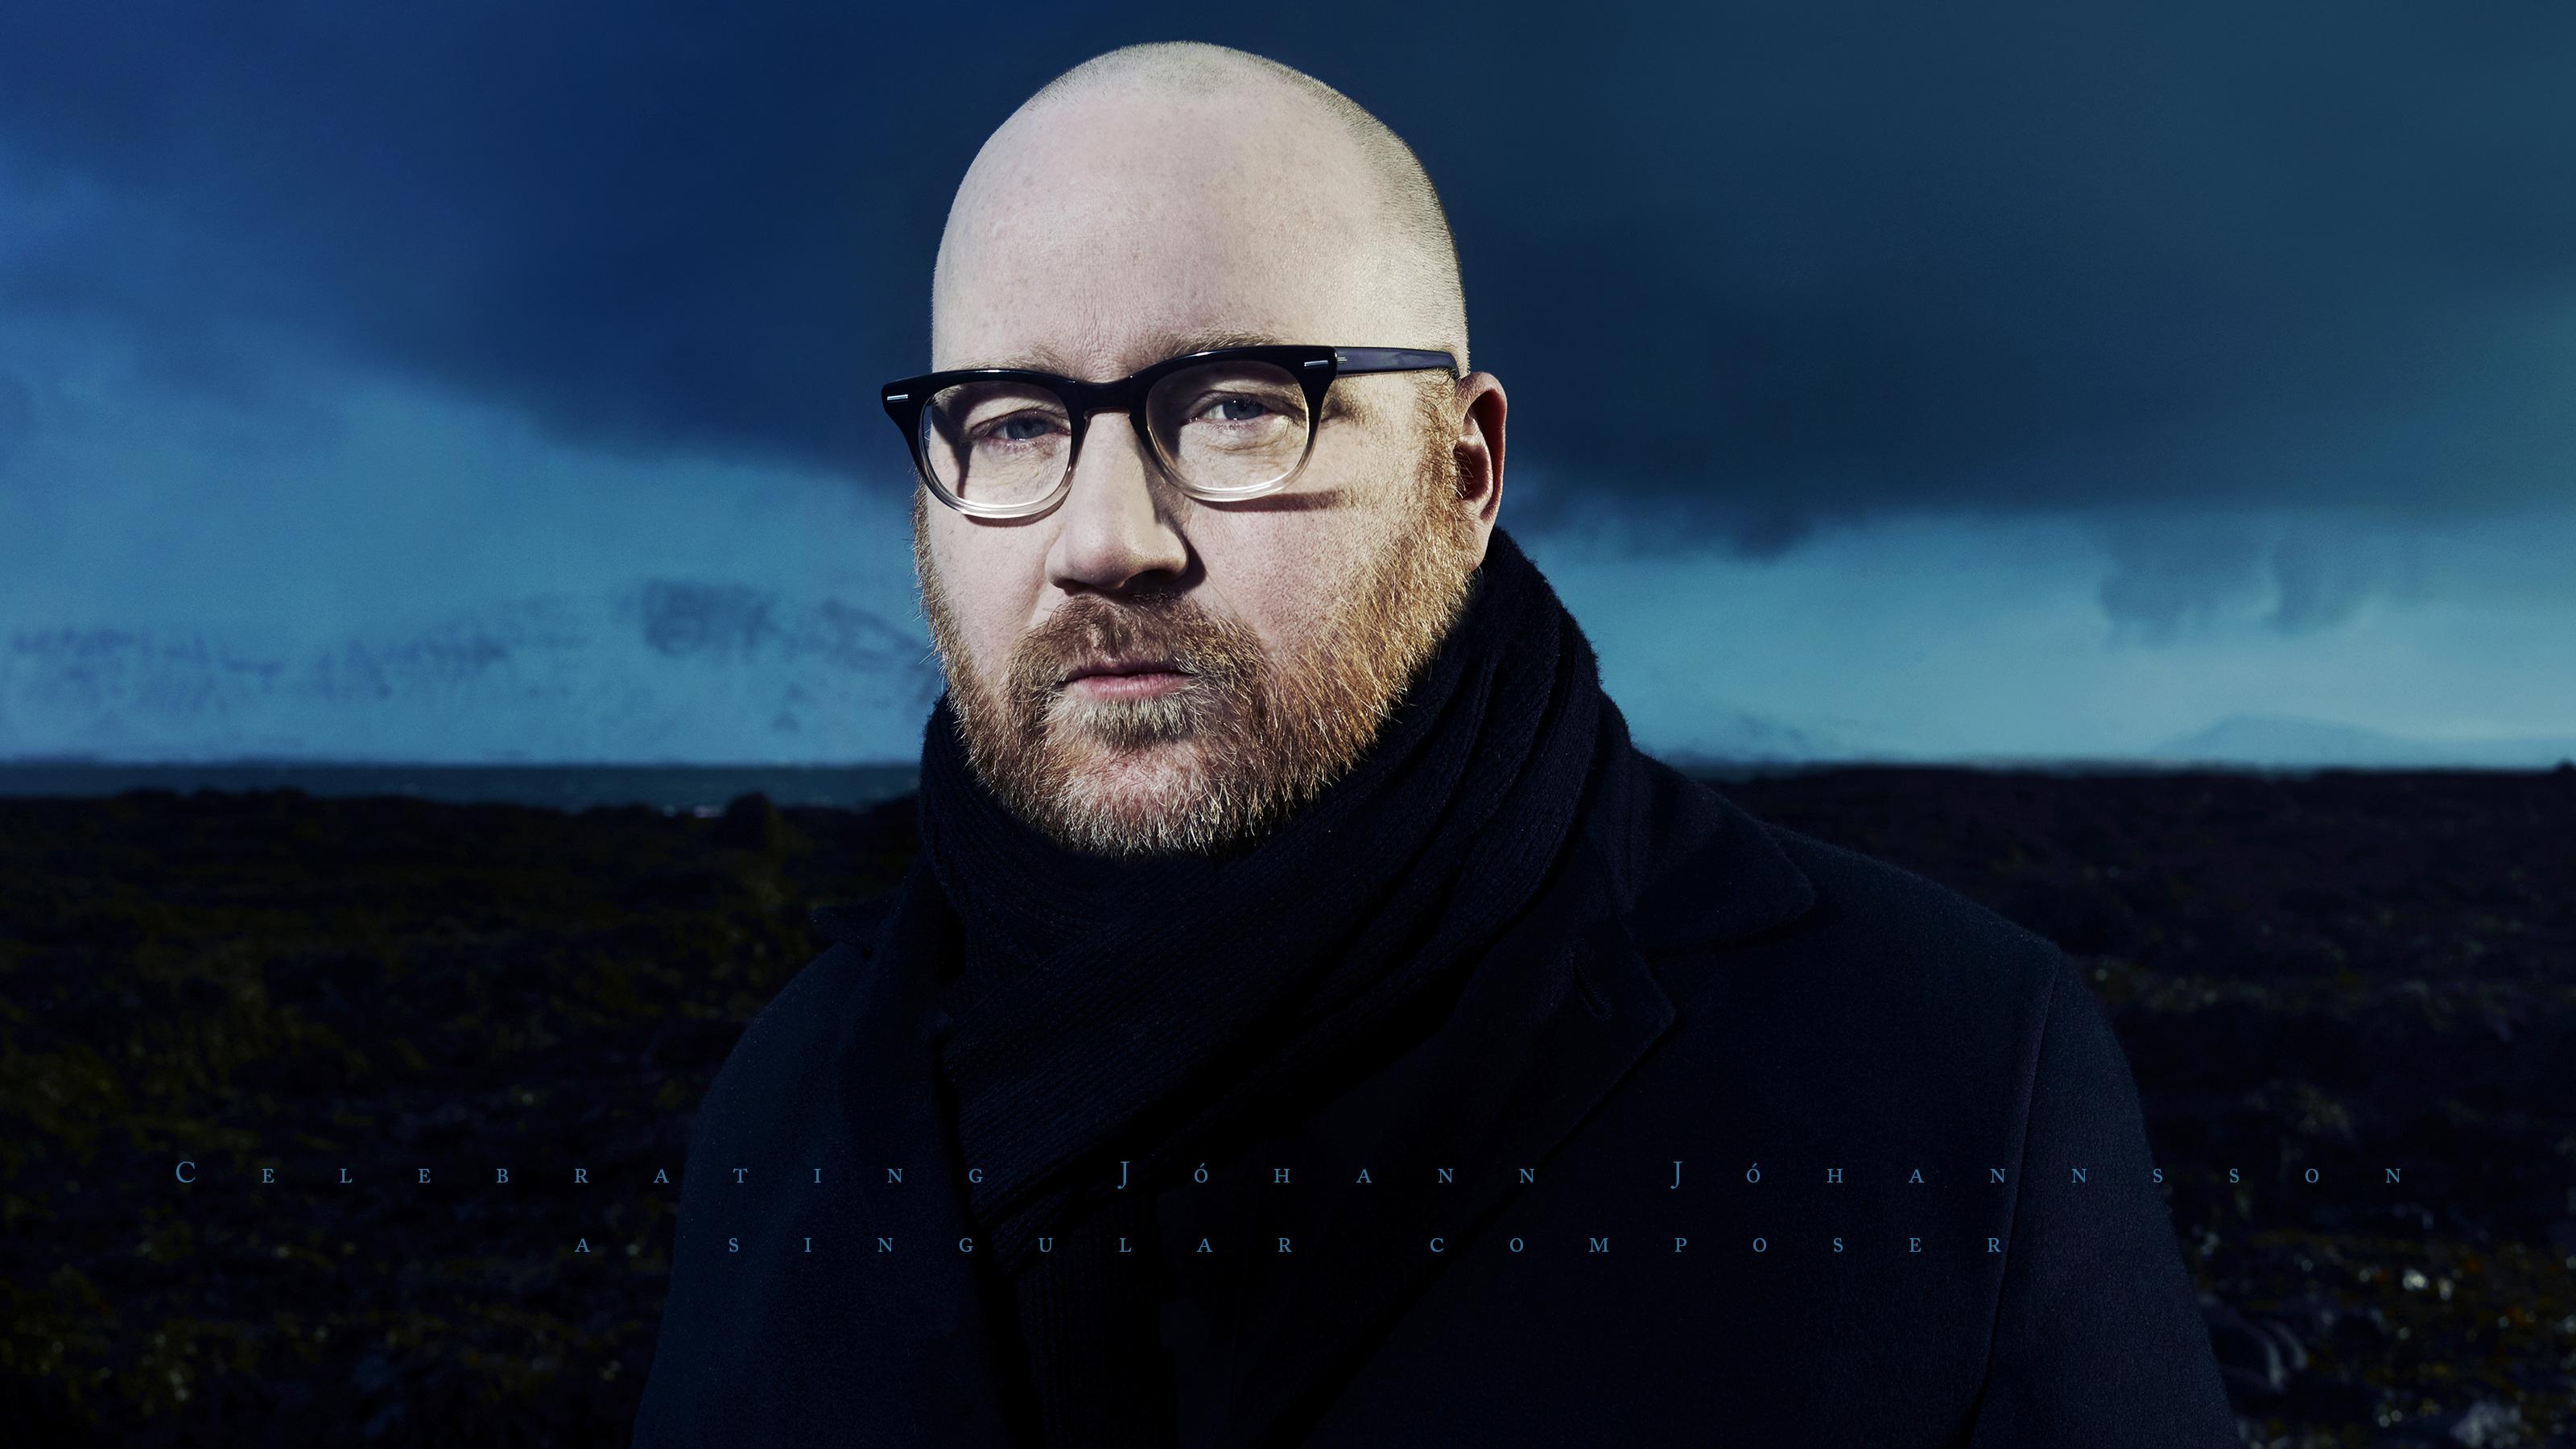 Celebrating Jóhann Jóhannsson, a singular composer